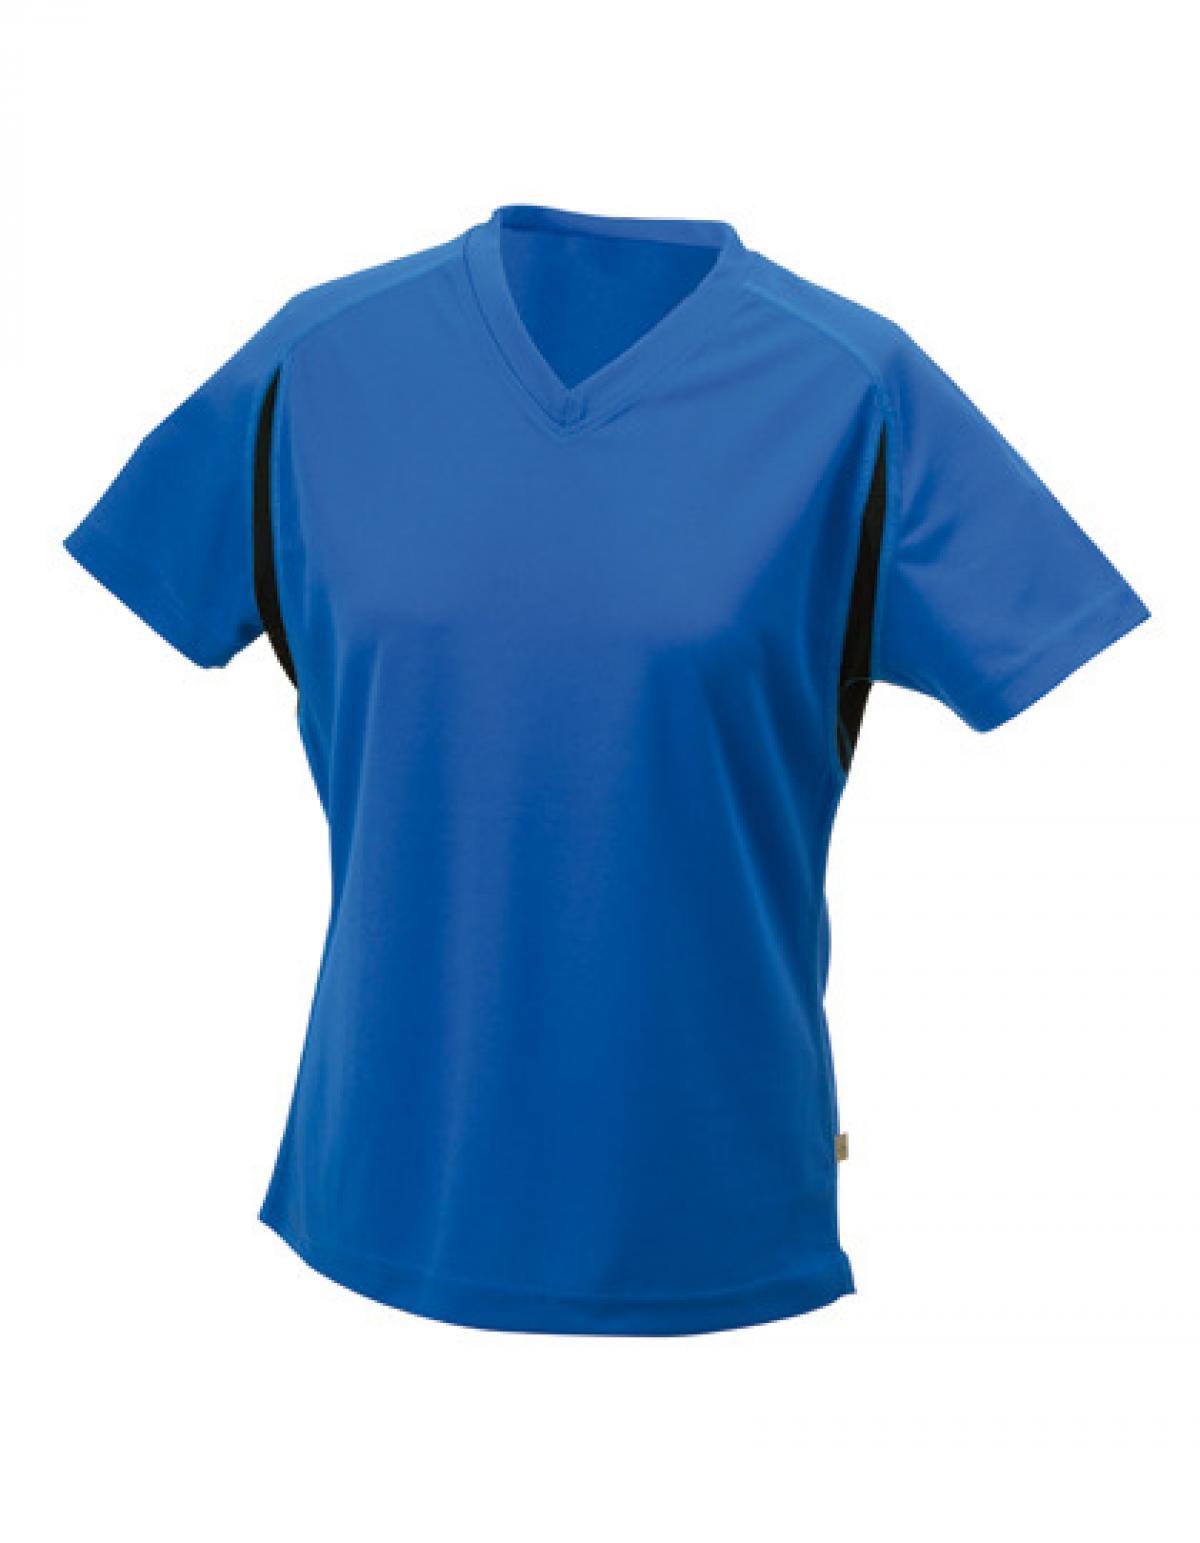 damen running sport t shirt atmungsaktiv rexlander s. Black Bedroom Furniture Sets. Home Design Ideas